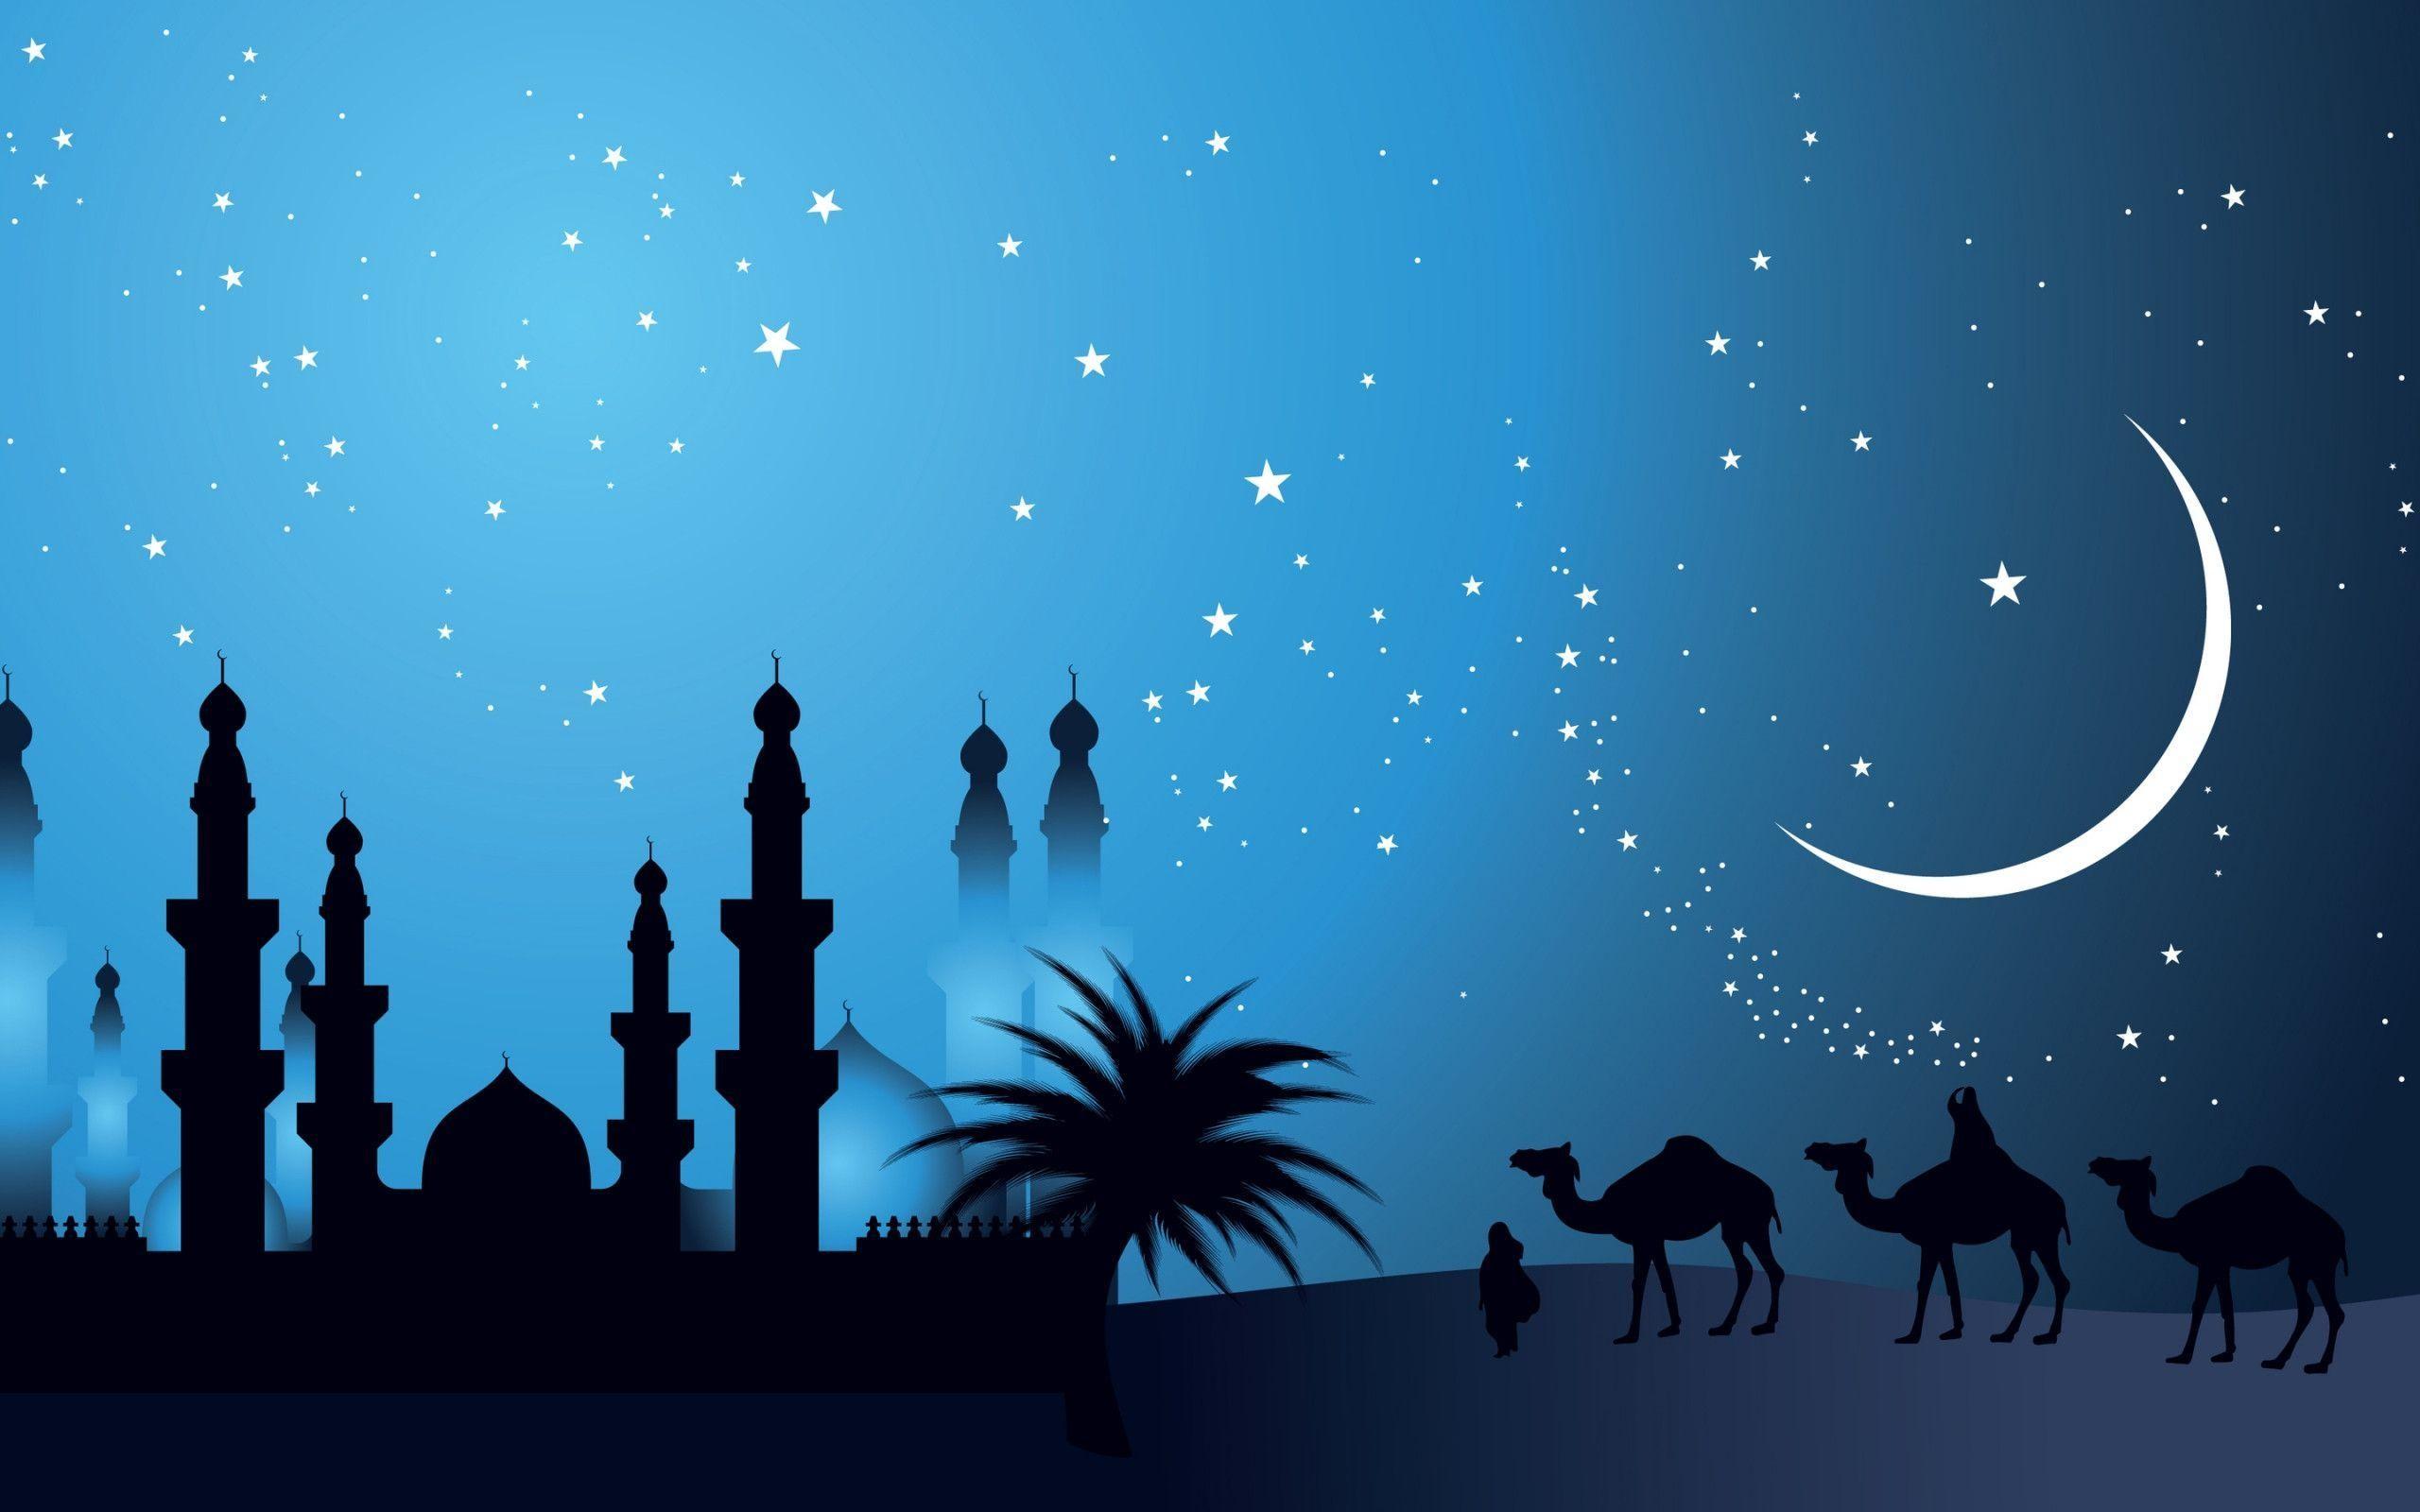 Verwonderend Islamic Wallpapers, Blue, Camel, Hd, Islamic Wallpaper, Moon WD-38